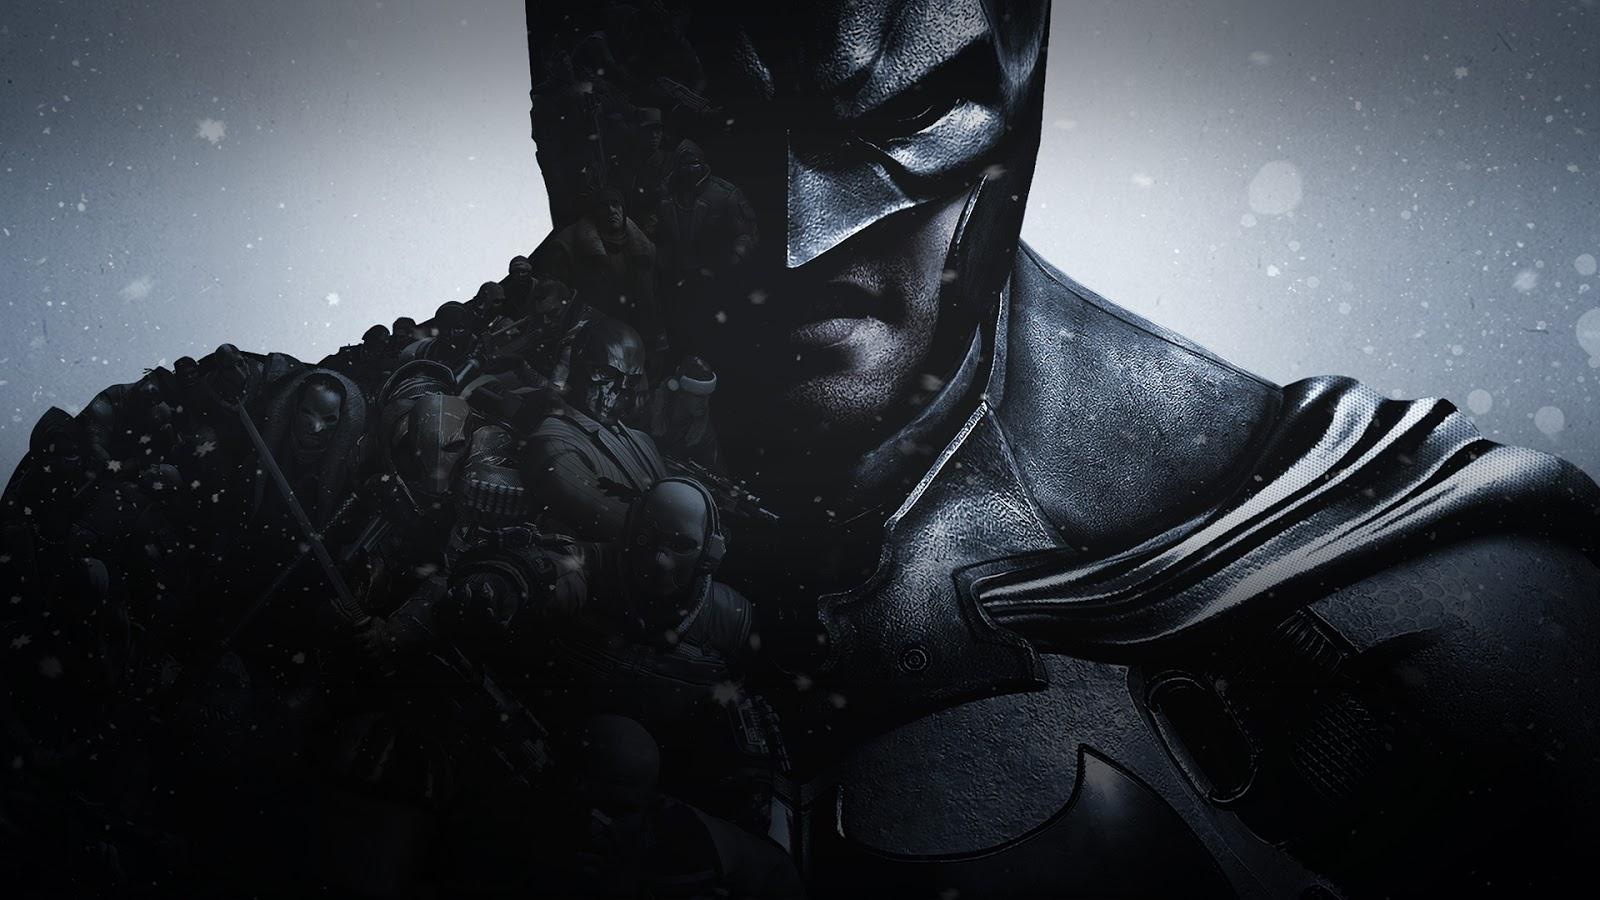 LEAGUE OF FICTION Batman Arkham Origins Desktop Wallpaper SDCC 2013 1600x900